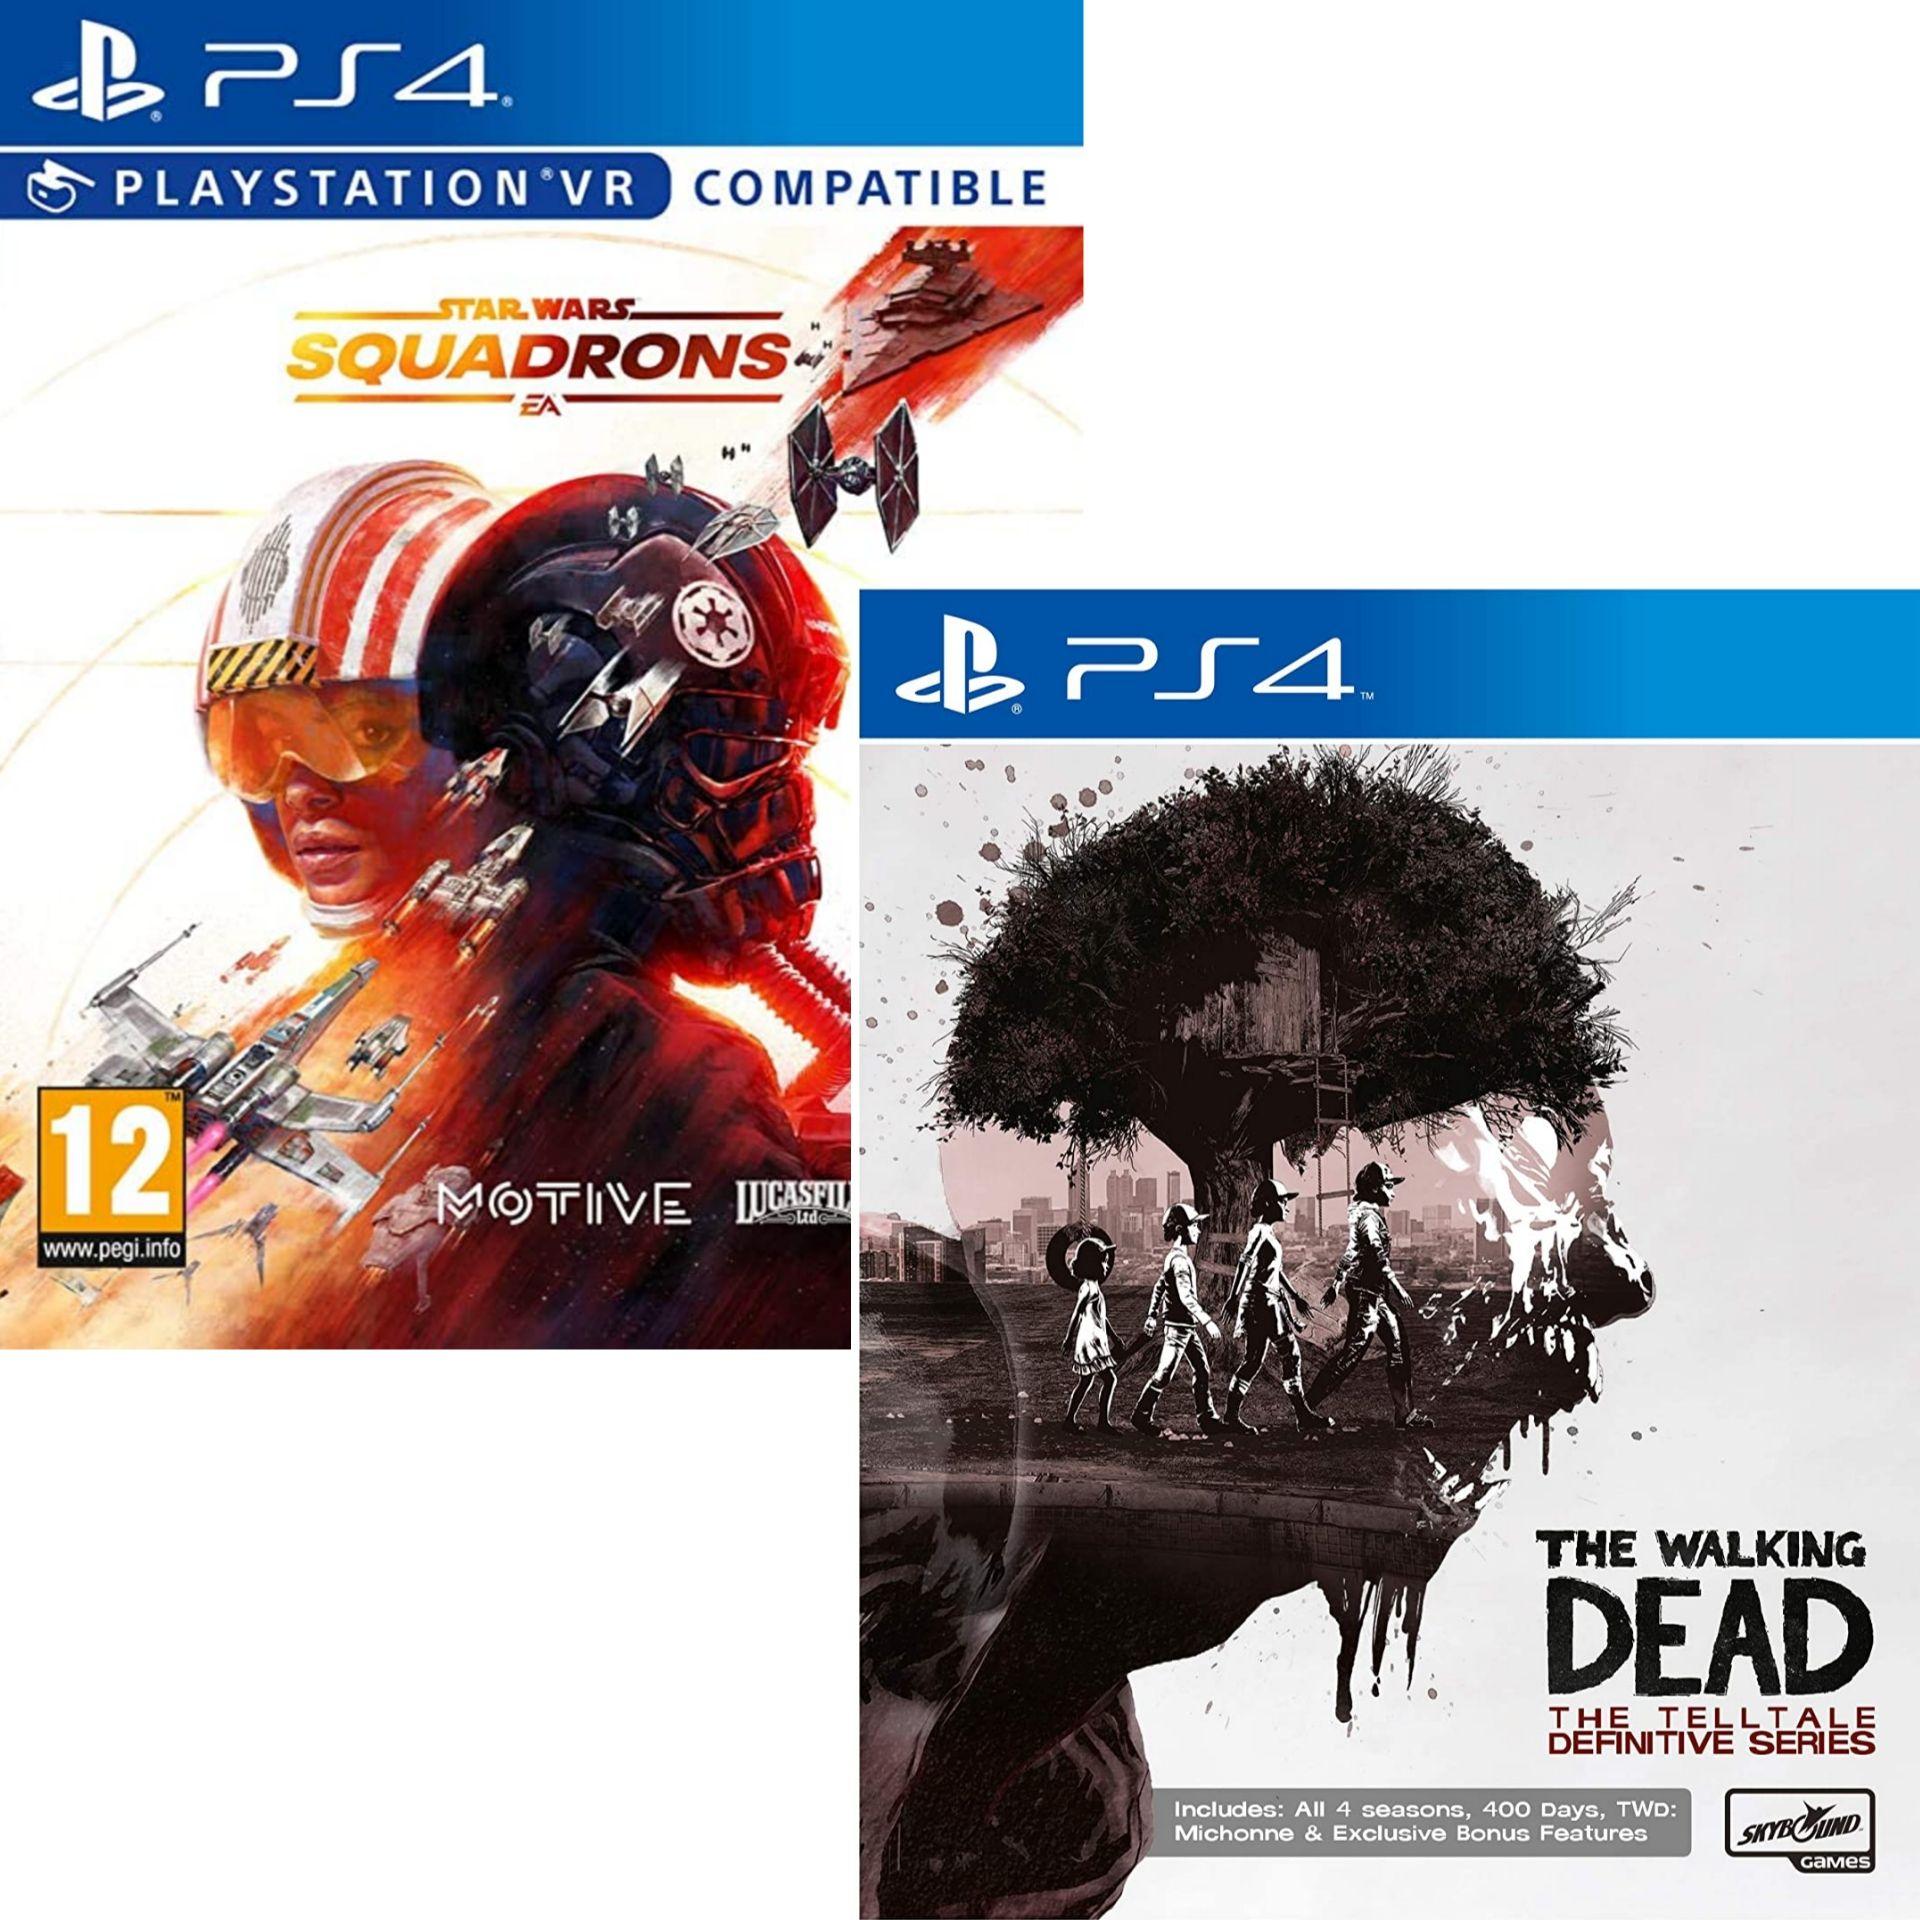 The Walking Dead: The Telltale Definitive Series ou Star Wars Squadrons sur PS4